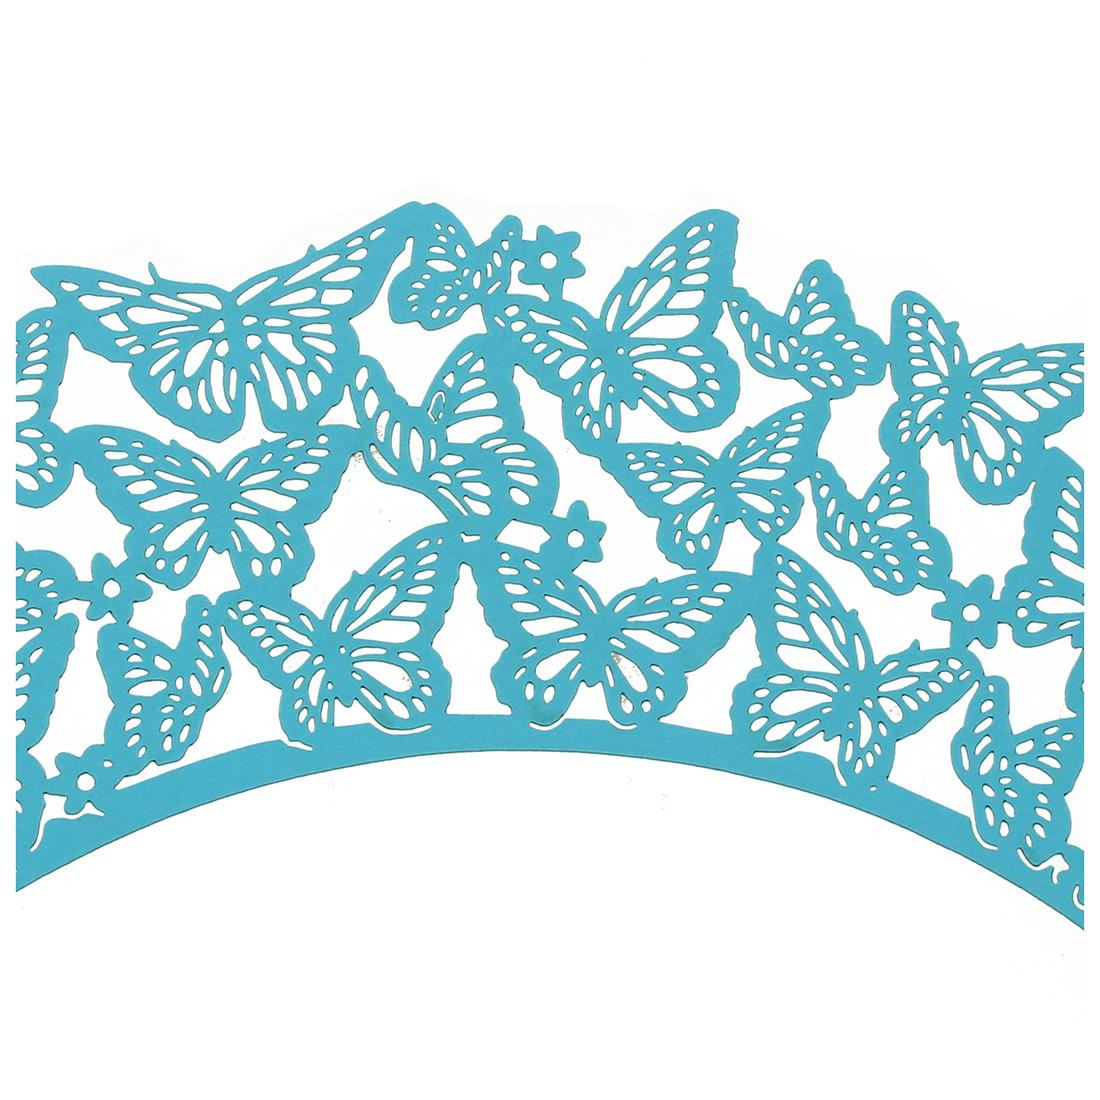 3X-25pcs-Diseno-original-de-Mariposas-Magdalena-Envolturas-Azul-Cielo-A3O8